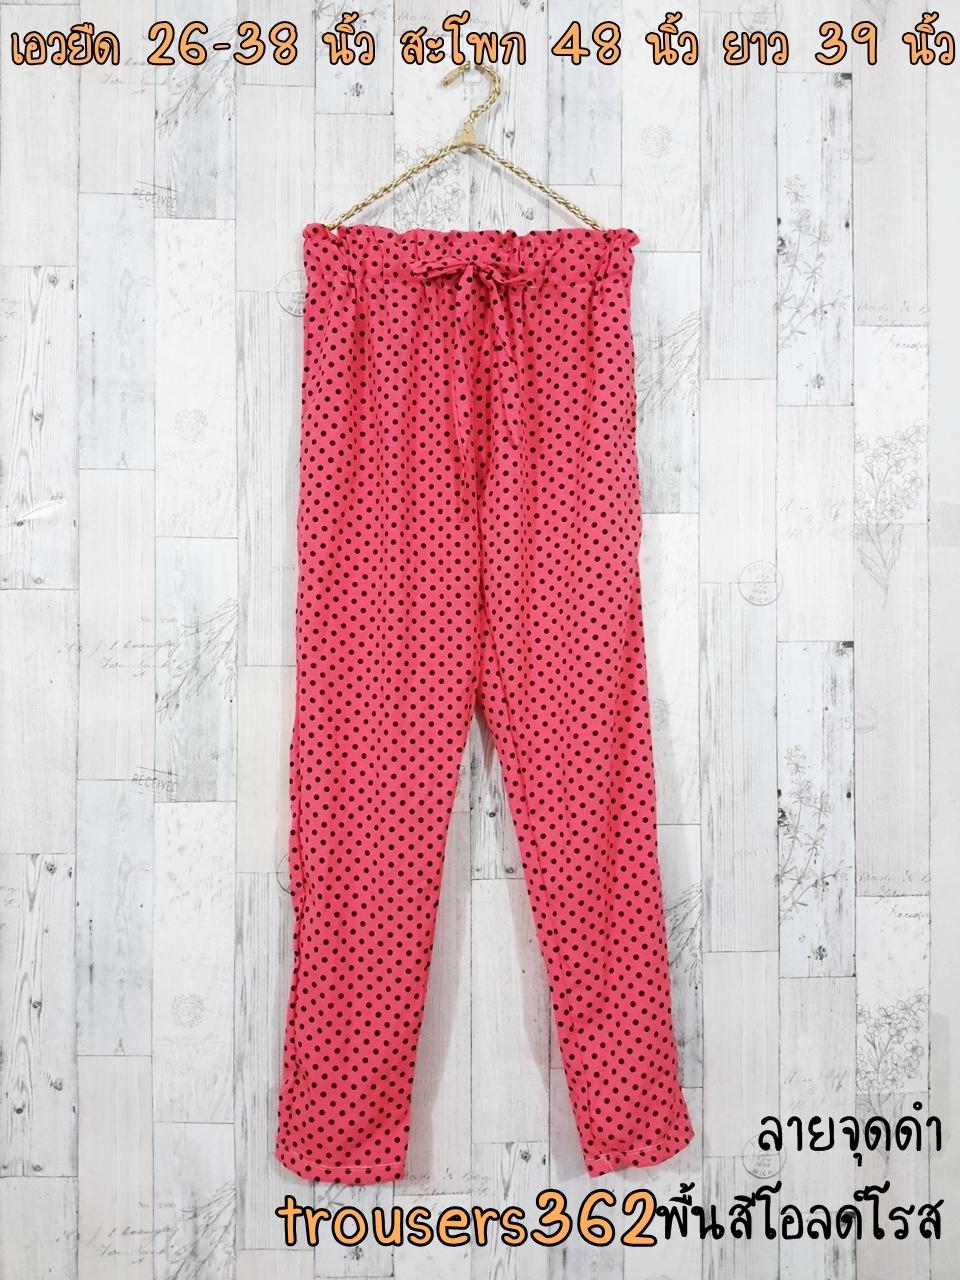 trousers362 กางเกงขายาวผ้าไหมอิตาลีเอวยืด 26-38 นิ้ว ลายจุดเล็กพื้นสีโอลด์โรส